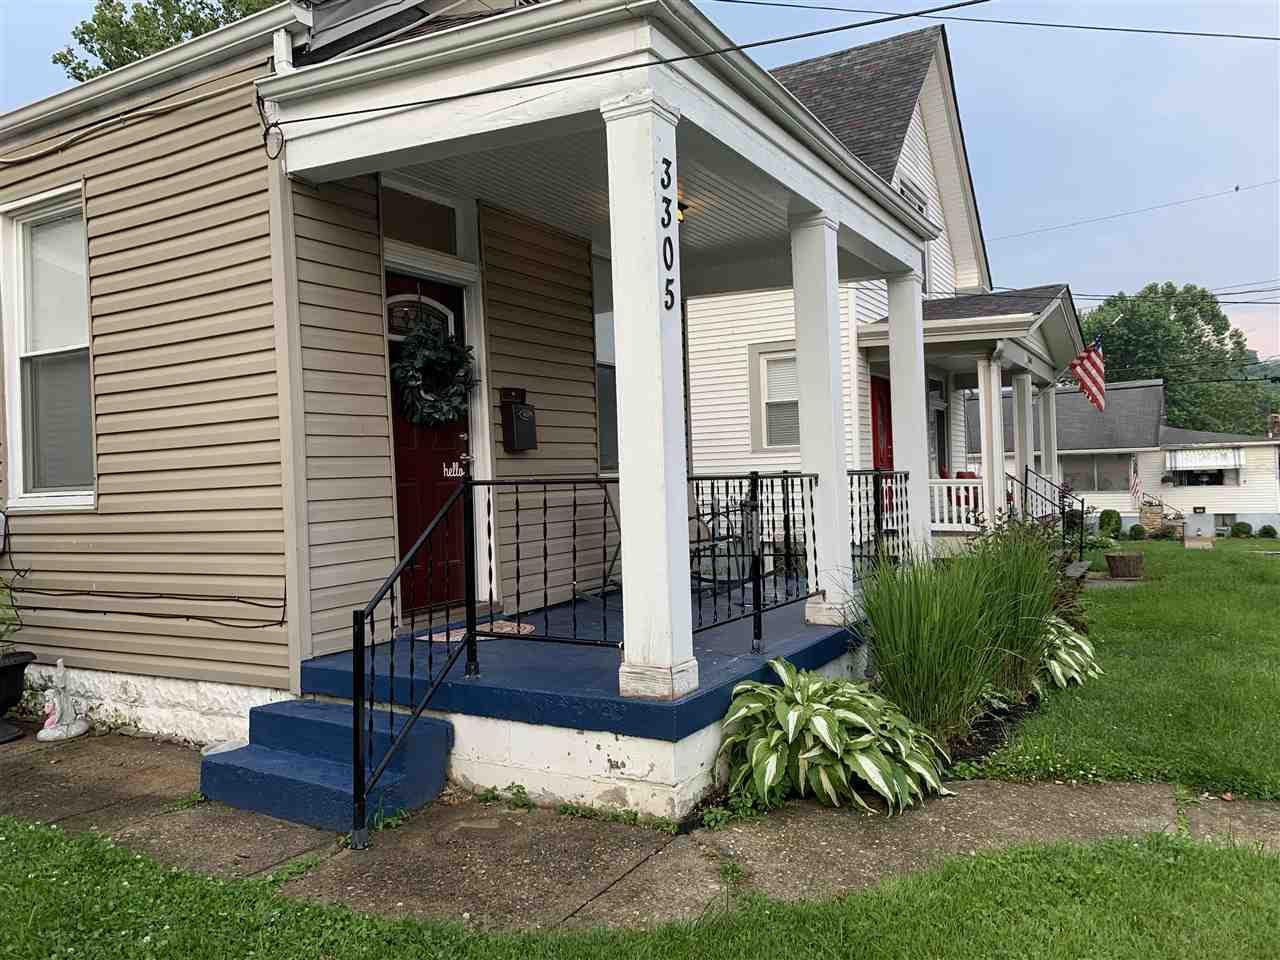 Photo 2 for 3305 Cottage Ave Covington, KY 41015